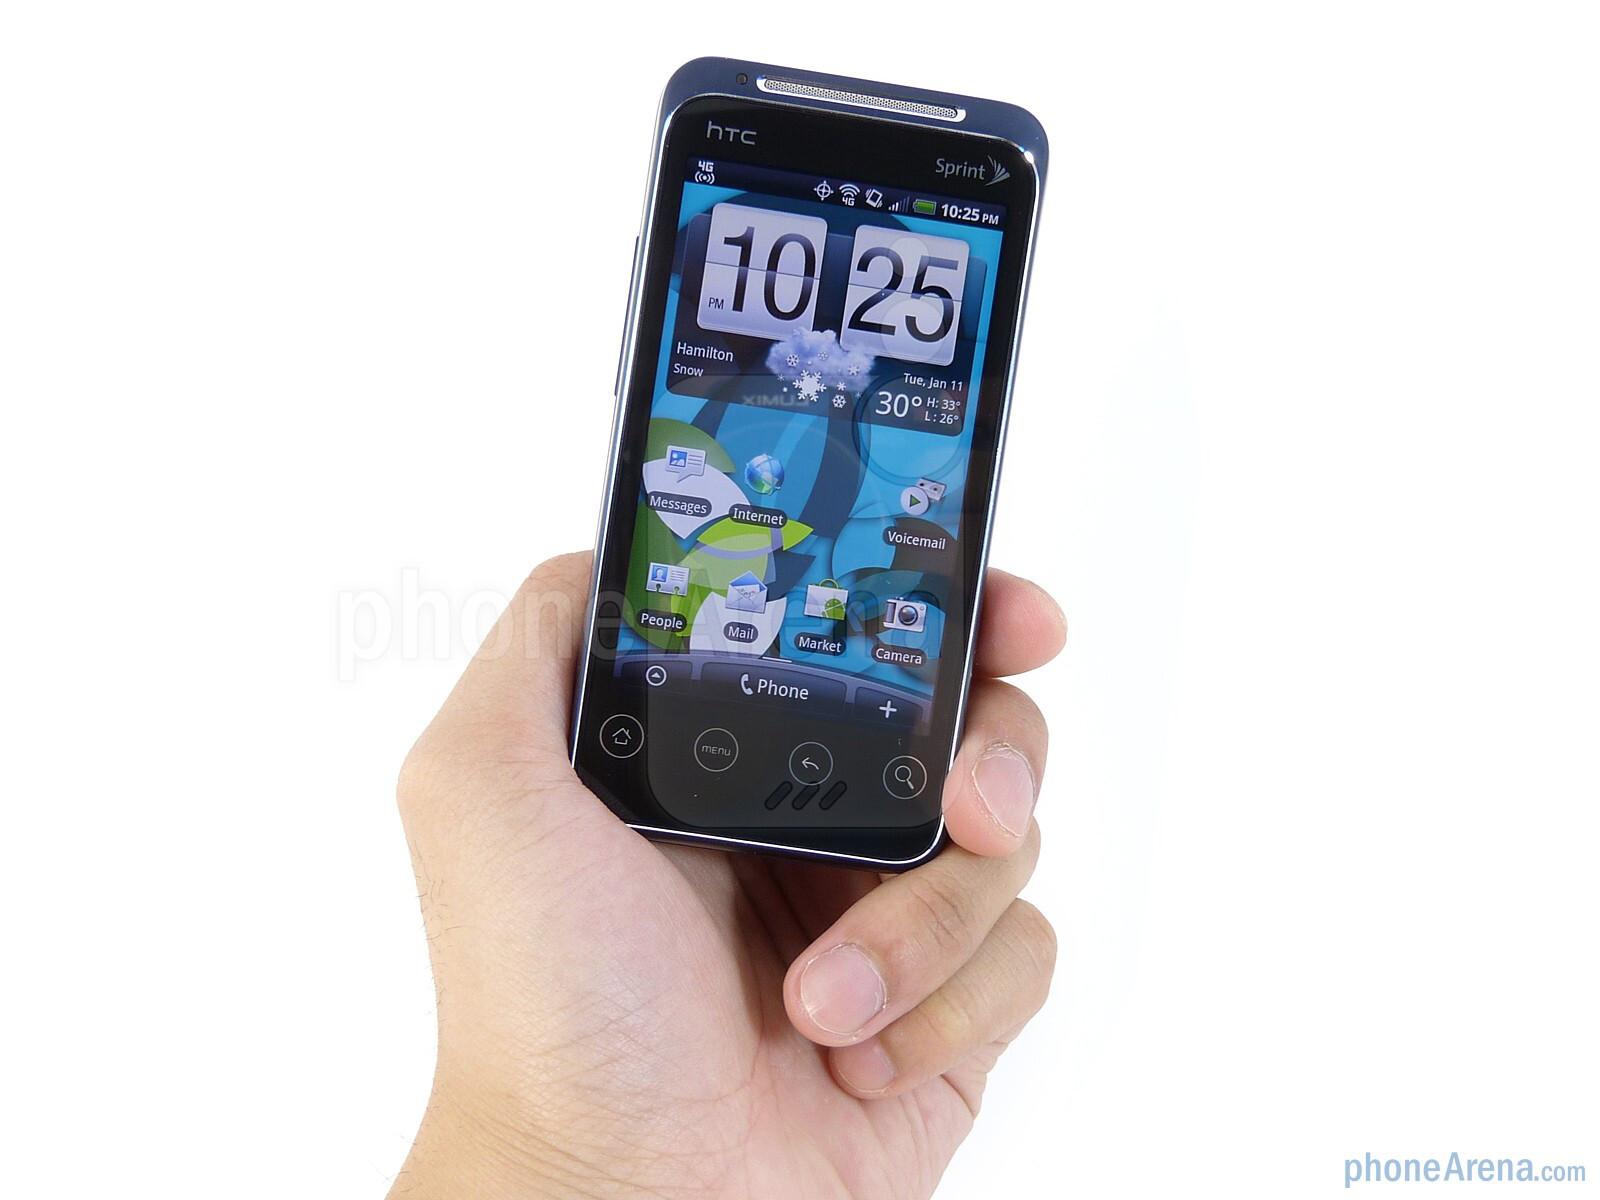 htc evo shift 4g review rh phonearena com HTC EVO Shift 4G Manual Sprint HTC EVO 4G Battery